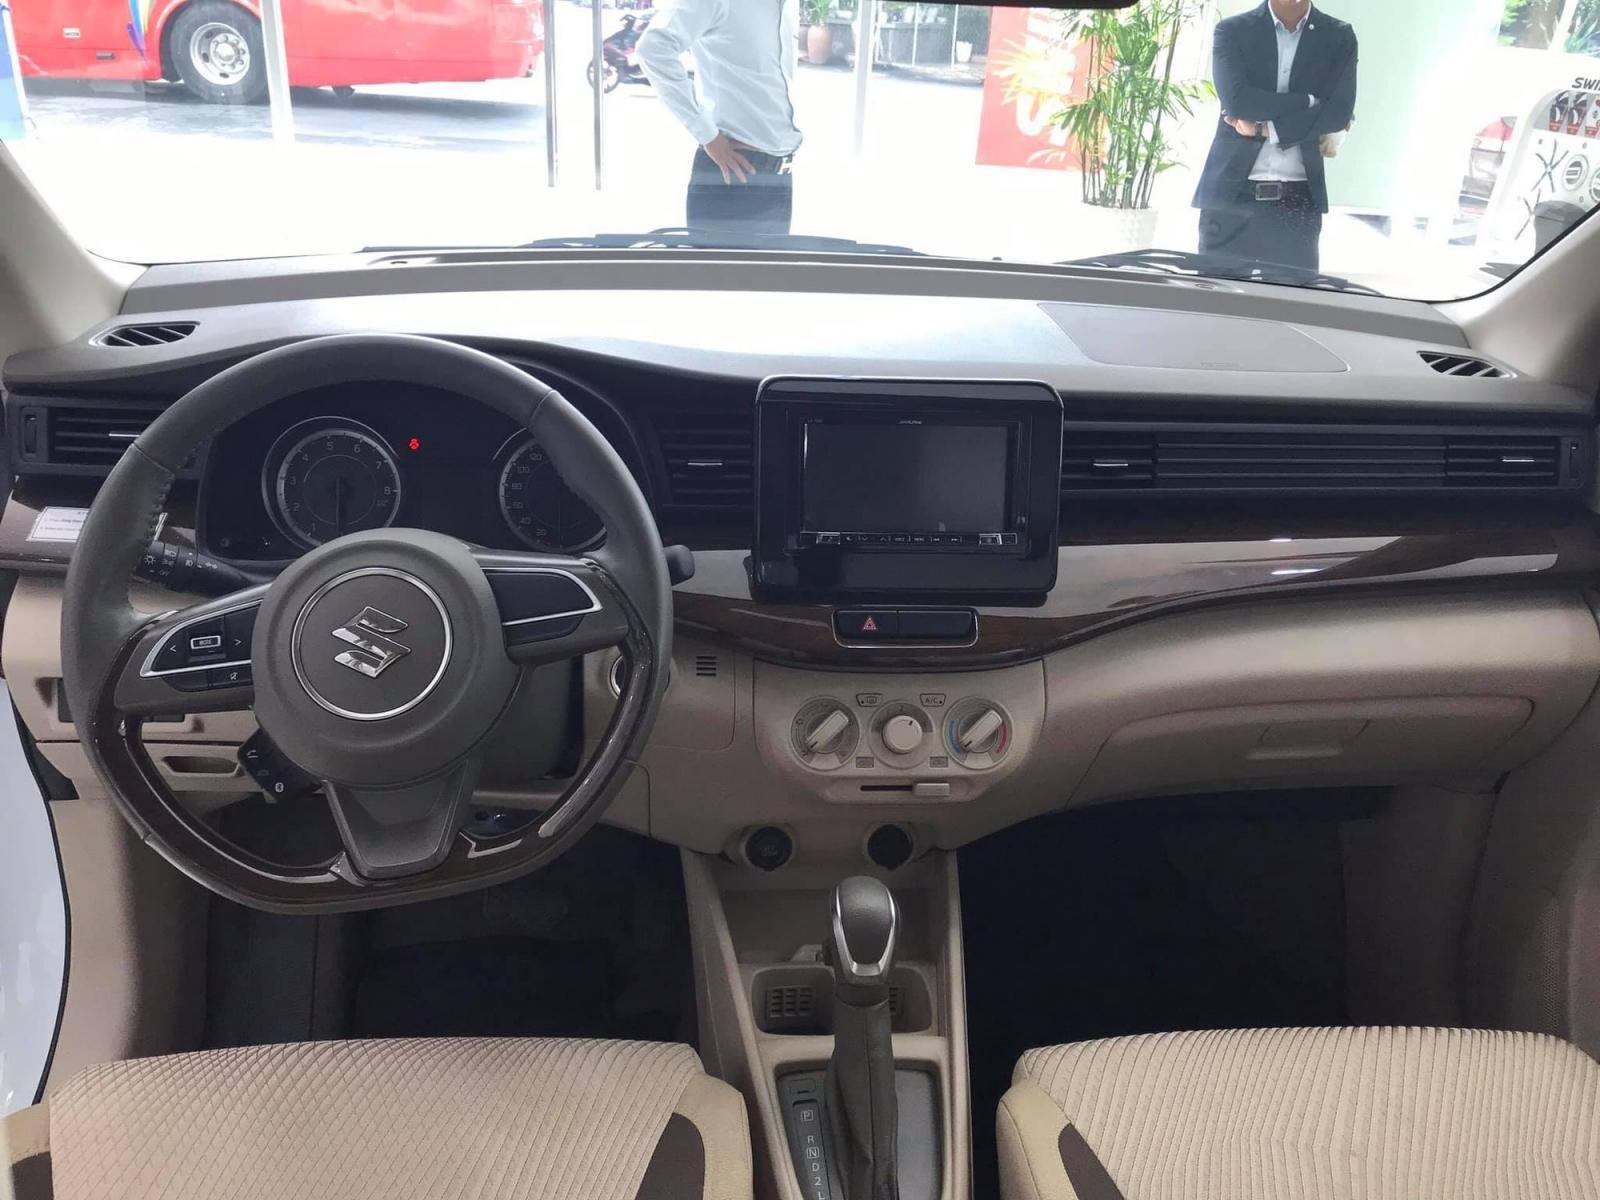 Bảng táp-lô của Suzuki Ertiga 2019 có dạng chữ T quen thuộc a1